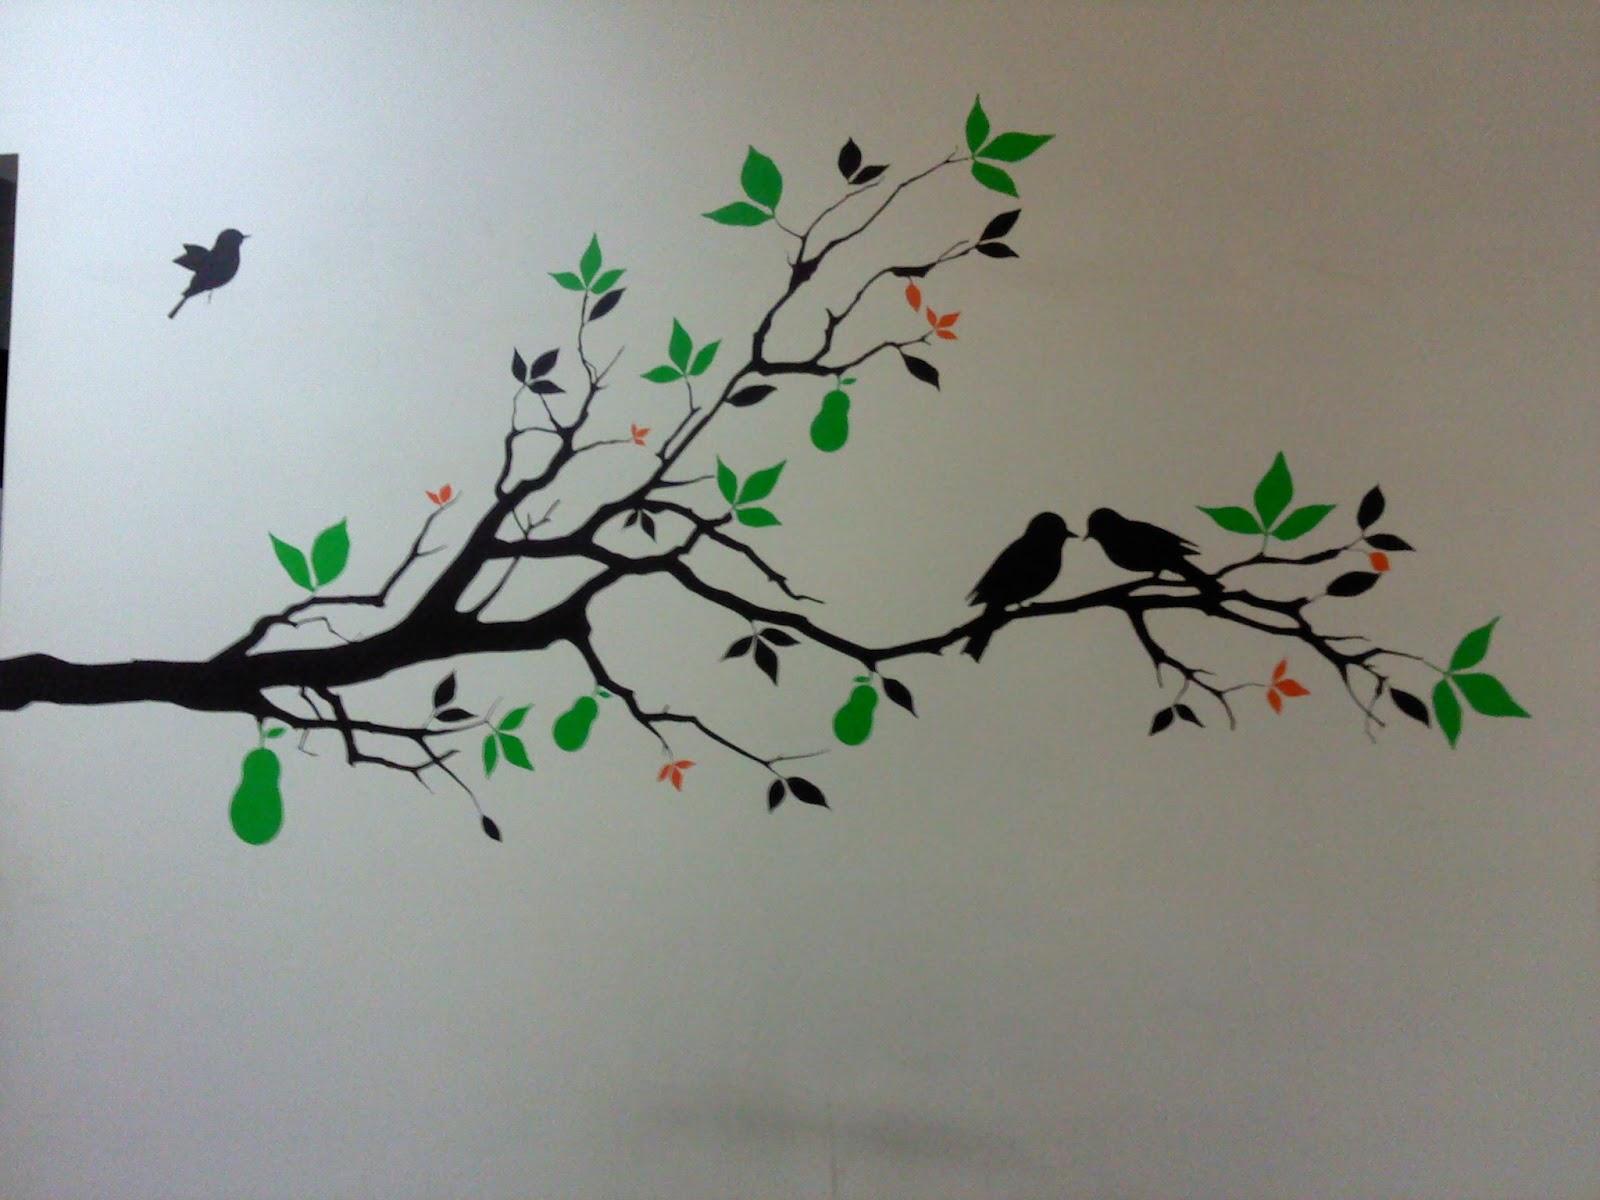 The Wall Decal Blog Gerbera On Grass Decal And Jackfruit